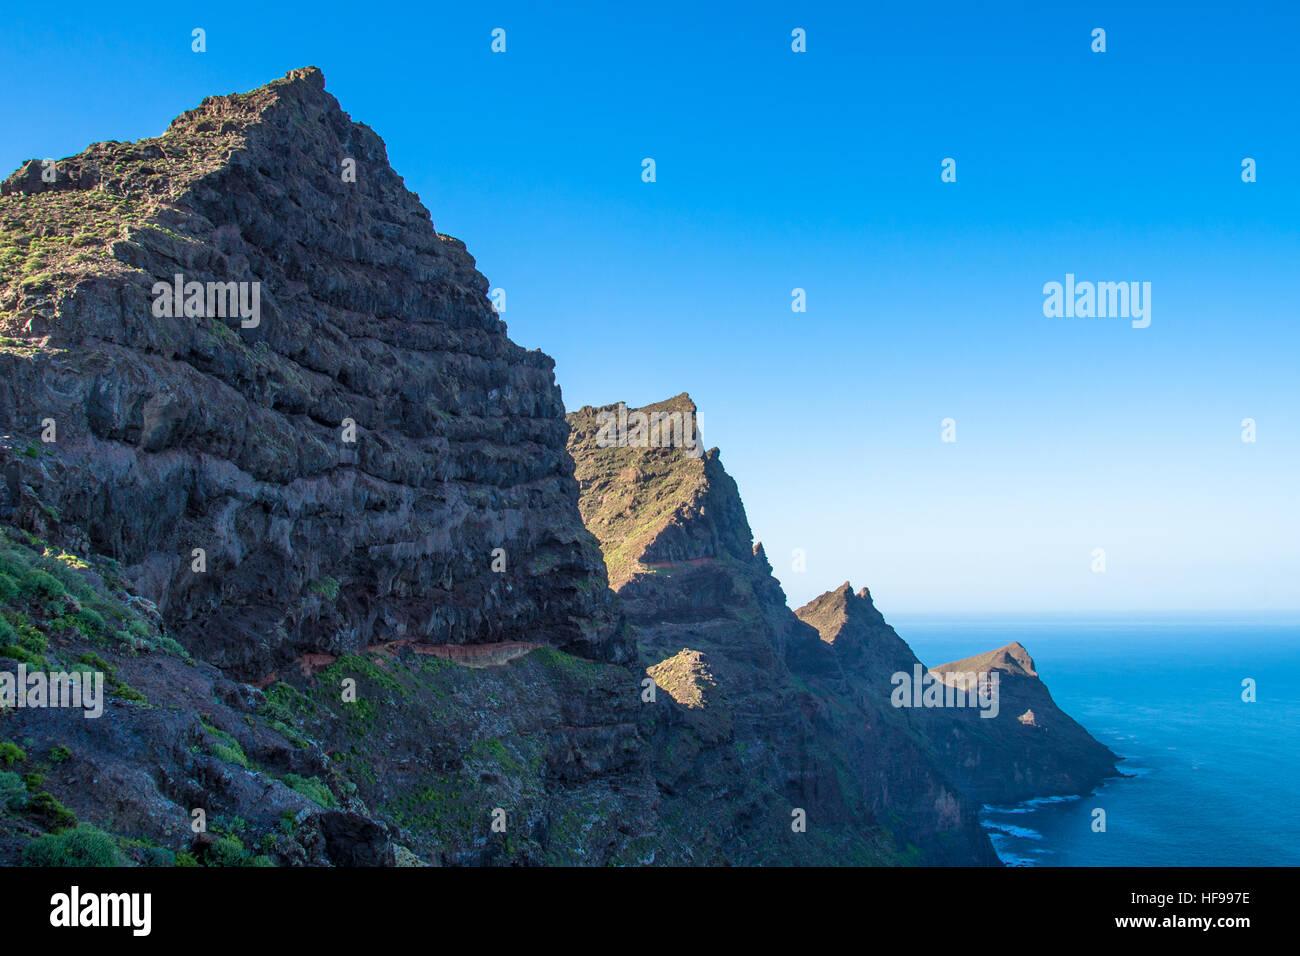 coast with rocks at Gran Canaria, Spain Stock Photo